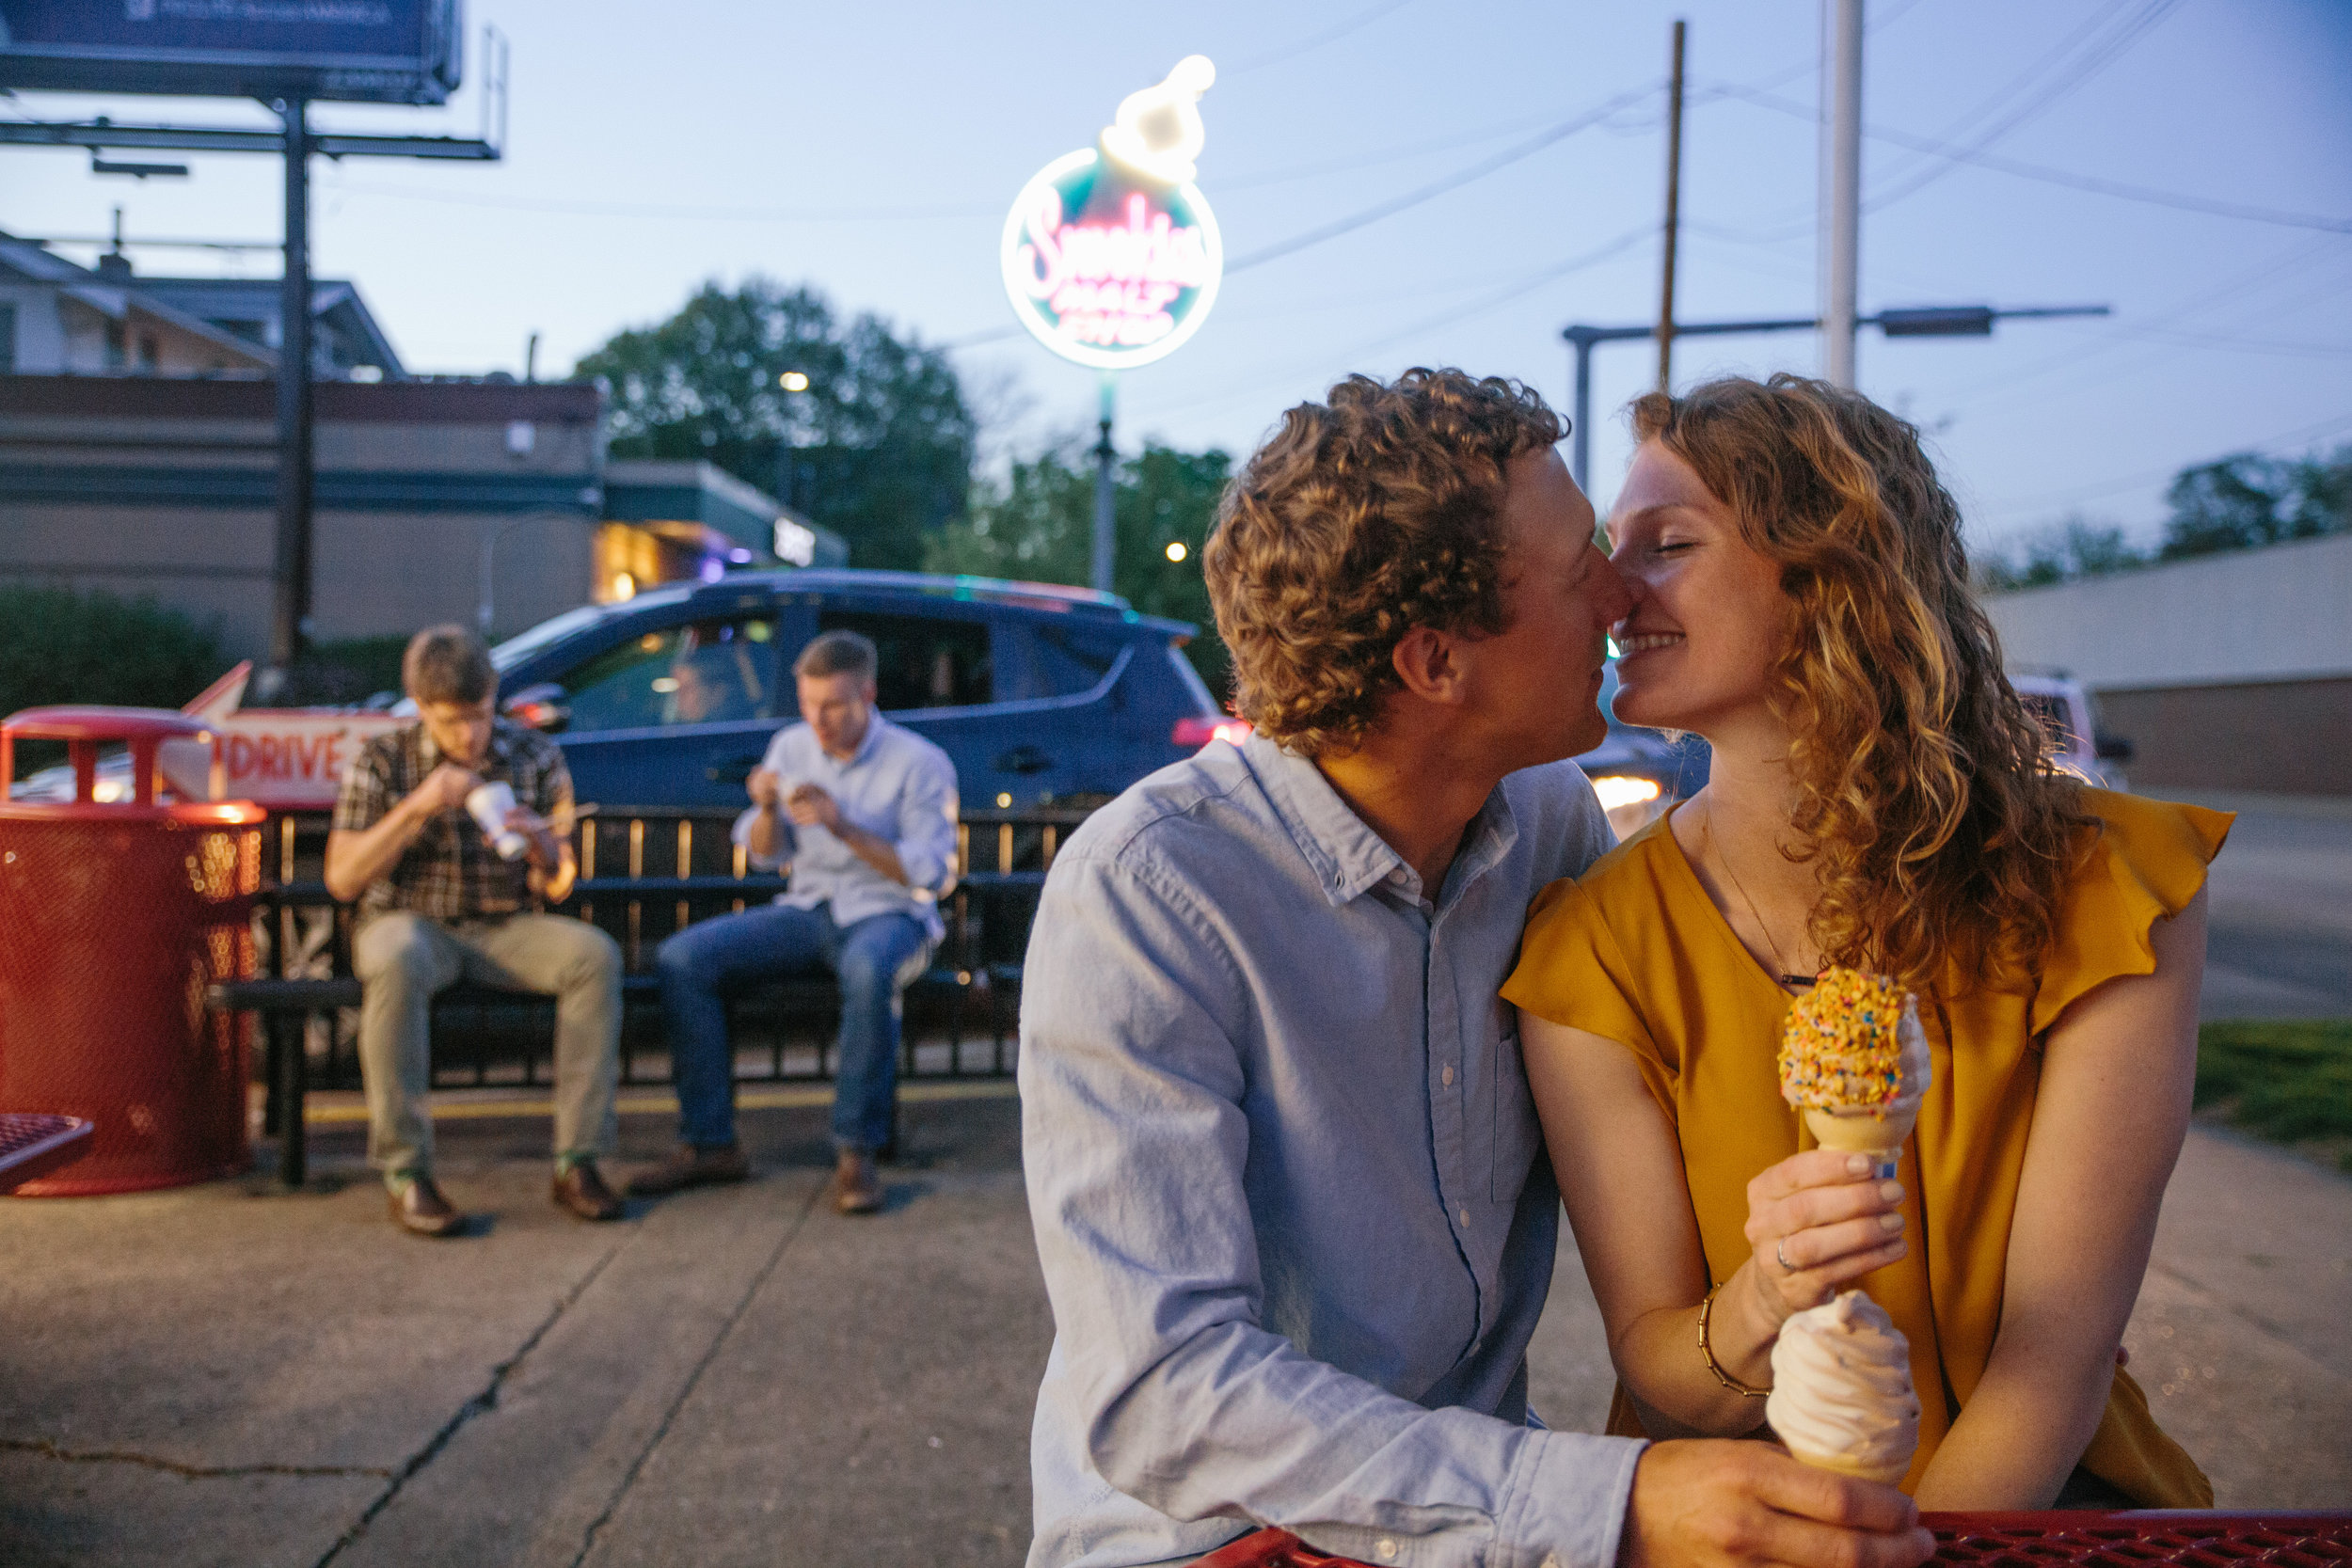 Ryan and Melanie Engagement | Des Moines Iowa Wedding Photographer Amelia Renee